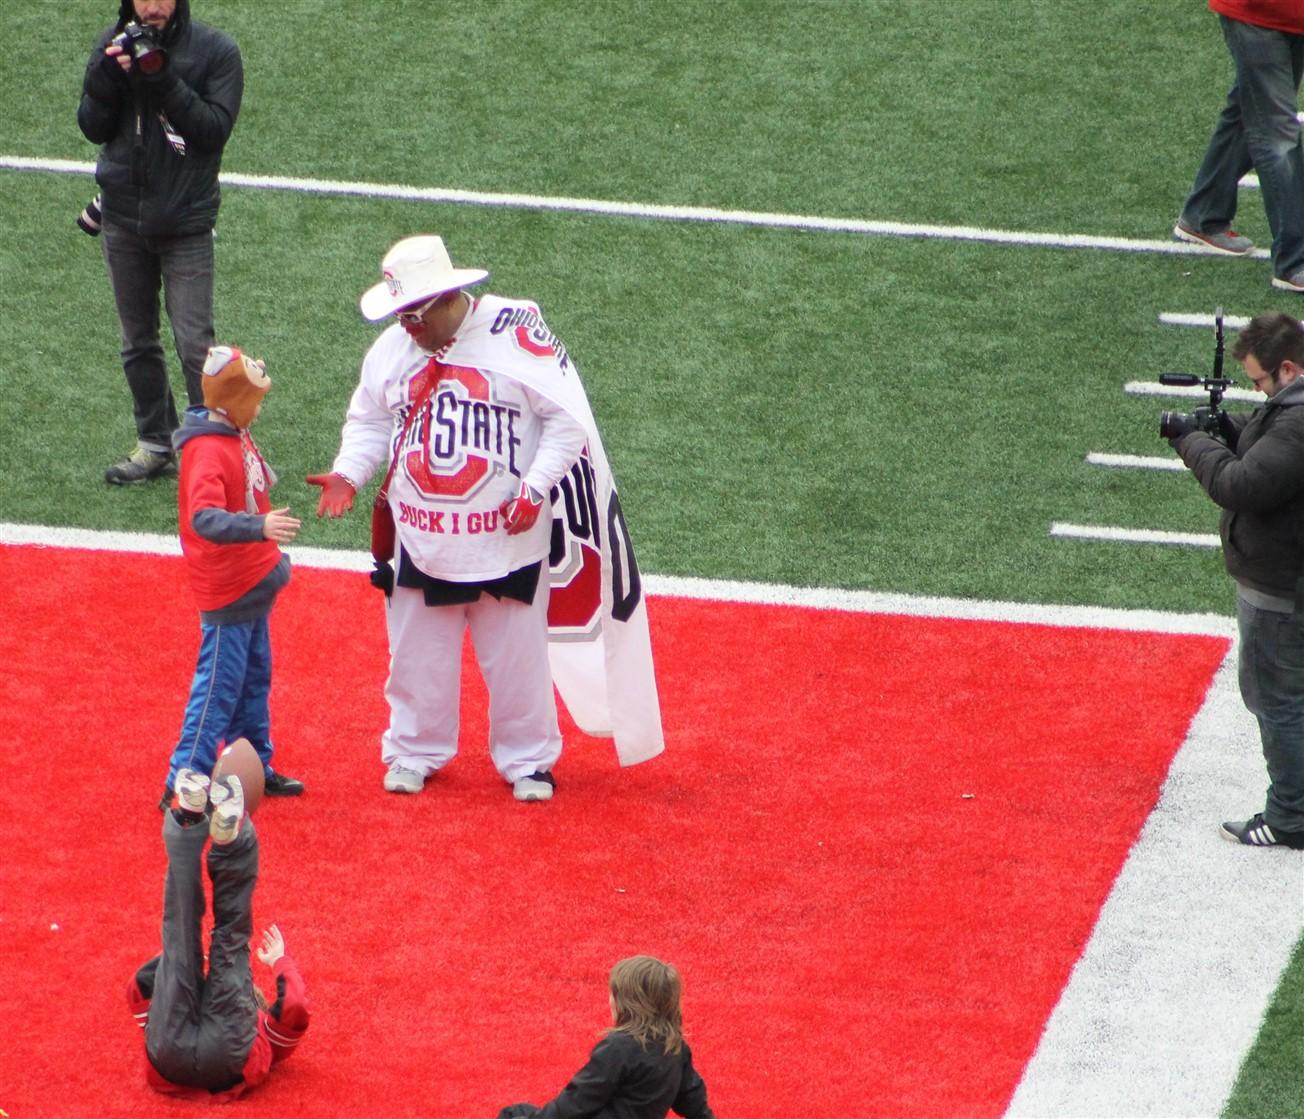 2015 01 24 5 Ohio State Championship Celebration.jpg